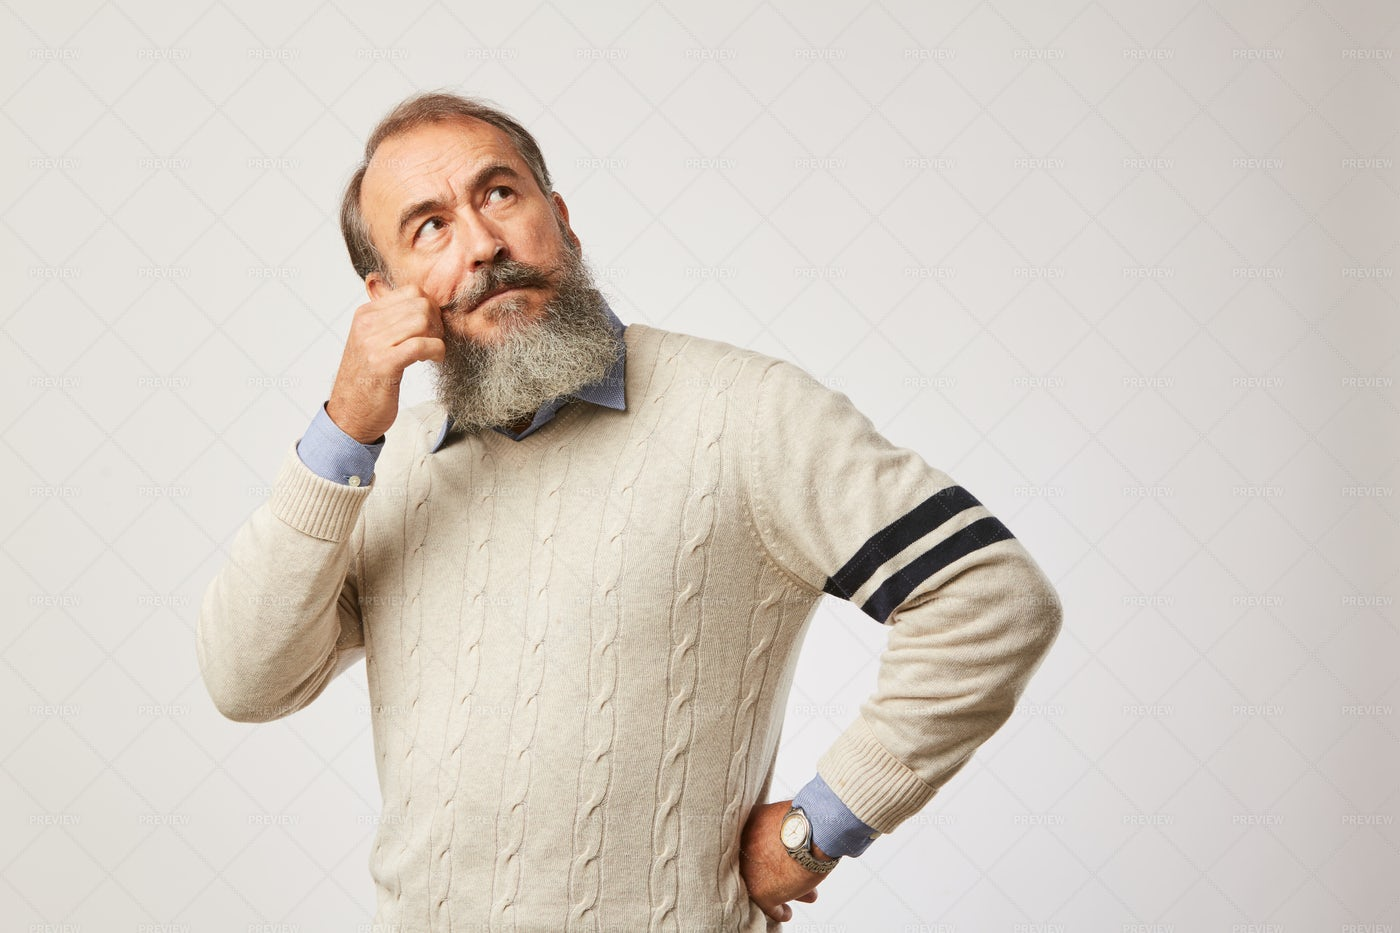 Man Thinking About Something: Stock Photos